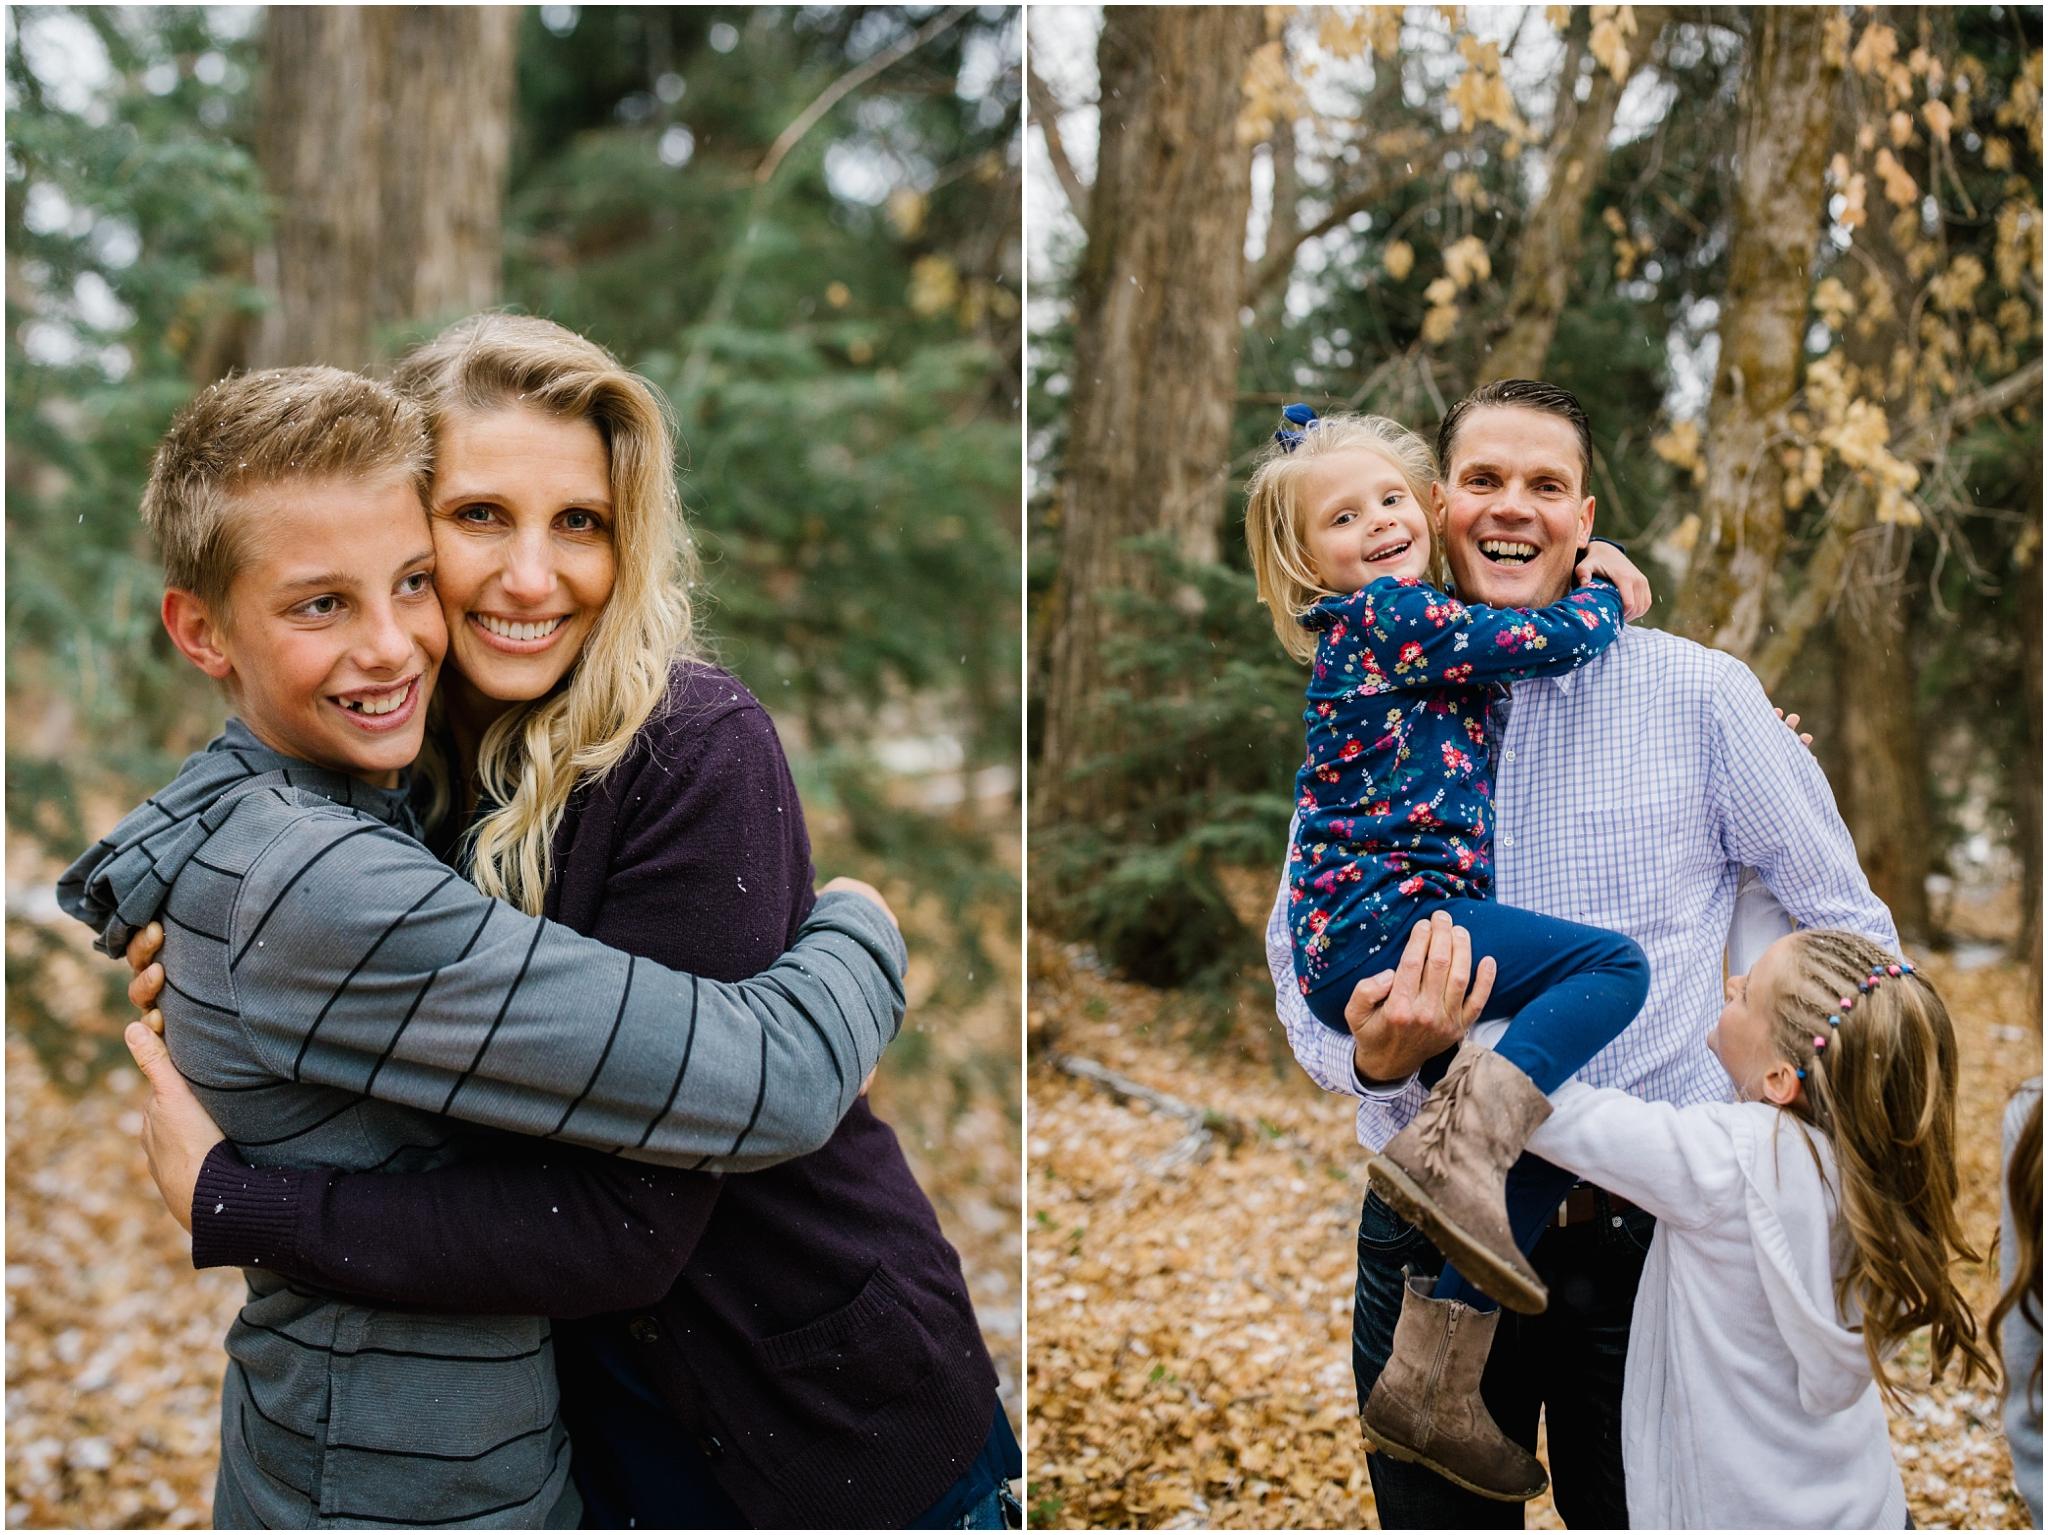 Vance-59_Lizzie-B-Imagery-Utah-Family-Photographer-Salt-Lake-City-Park-City-Utah-County-Payson-Canyon.jpg